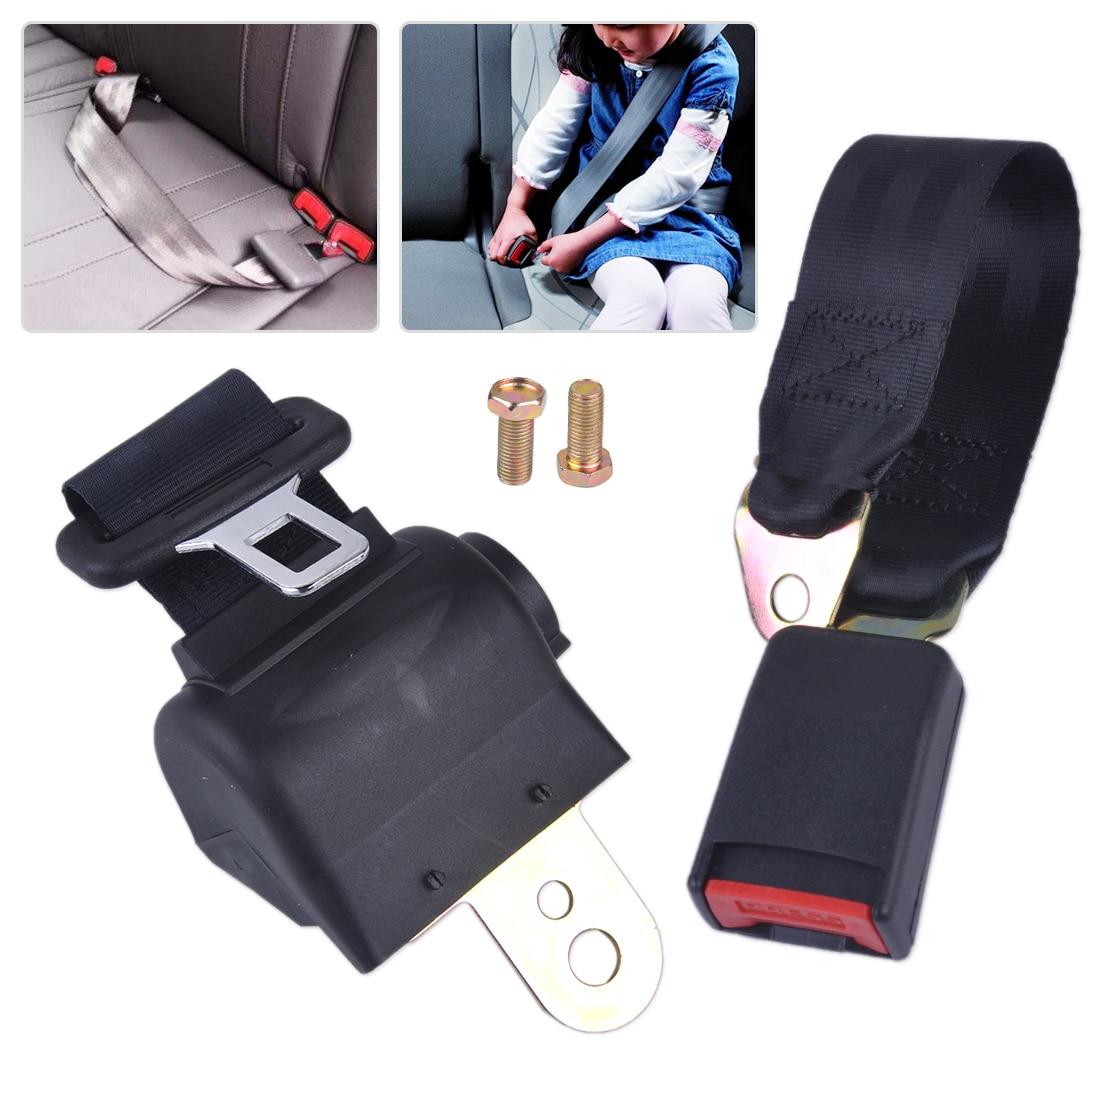 CITALL Car Universal Black 2 Point RetractableCar Auto Seat Safety Lap Belt Strap Buckle Adjustable Security Belt universal abs car safety belt buckle black